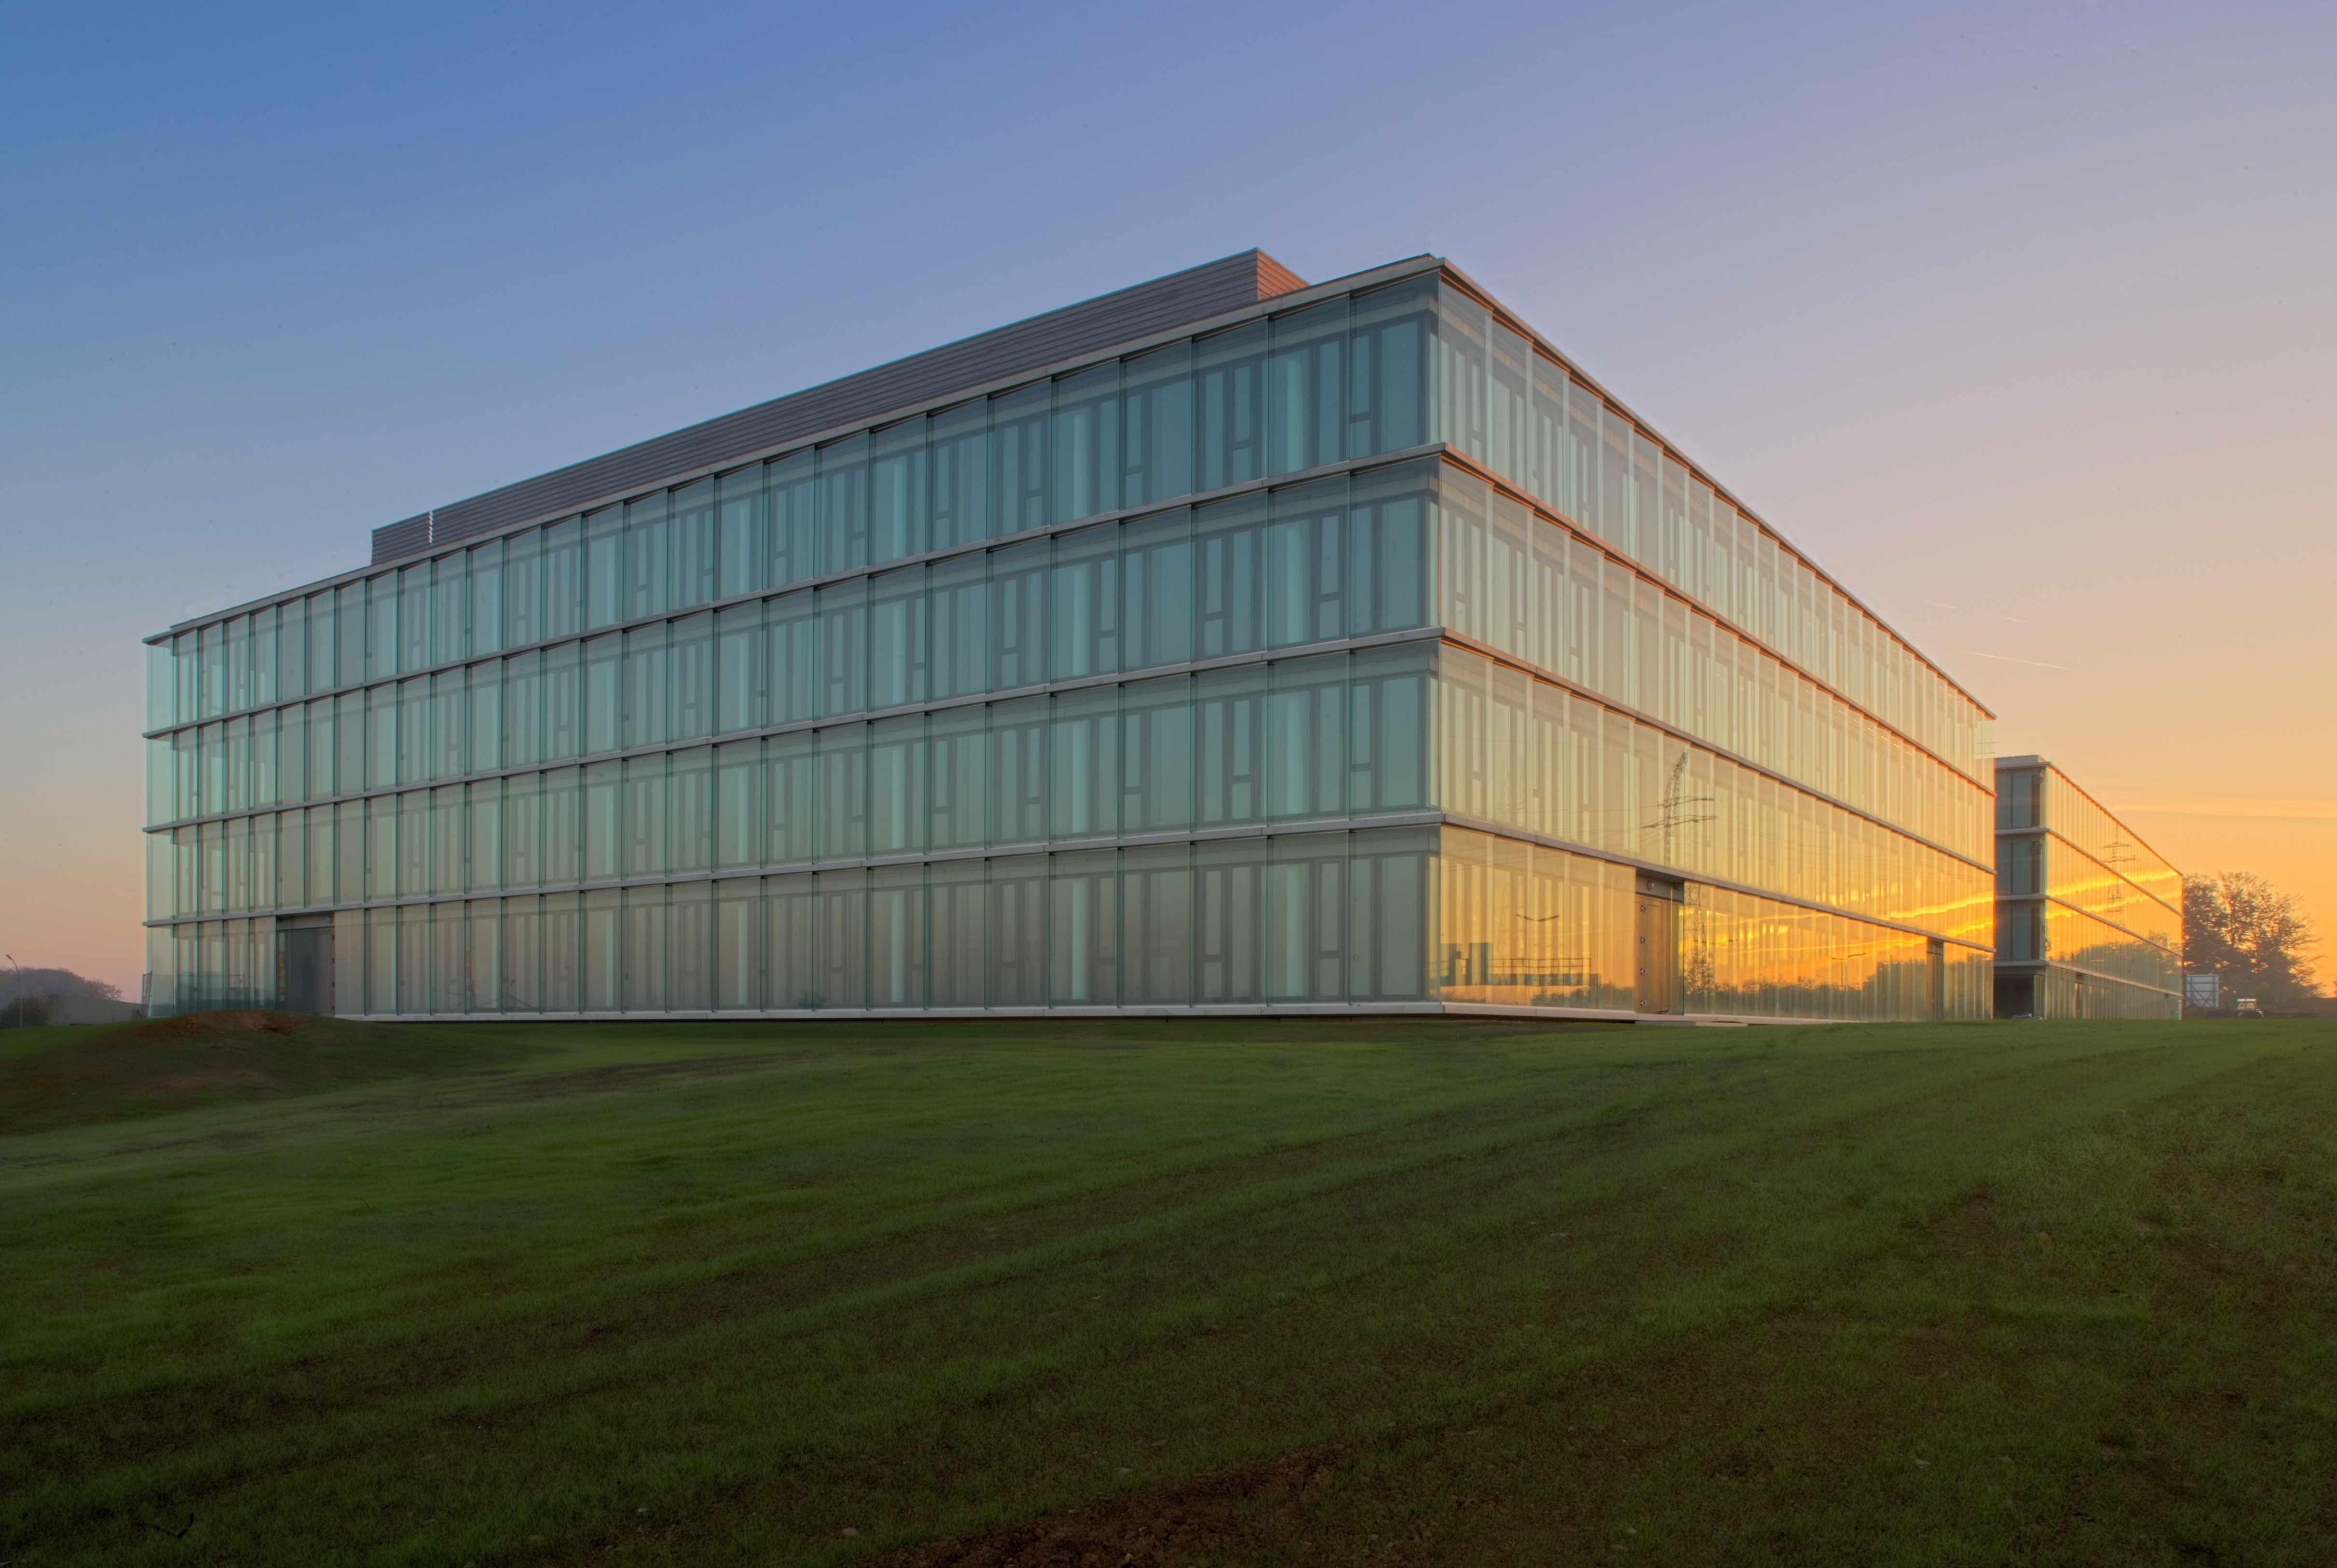 Architekten Luxemburg h2o howald heights offices luxemburg office block on the motorway